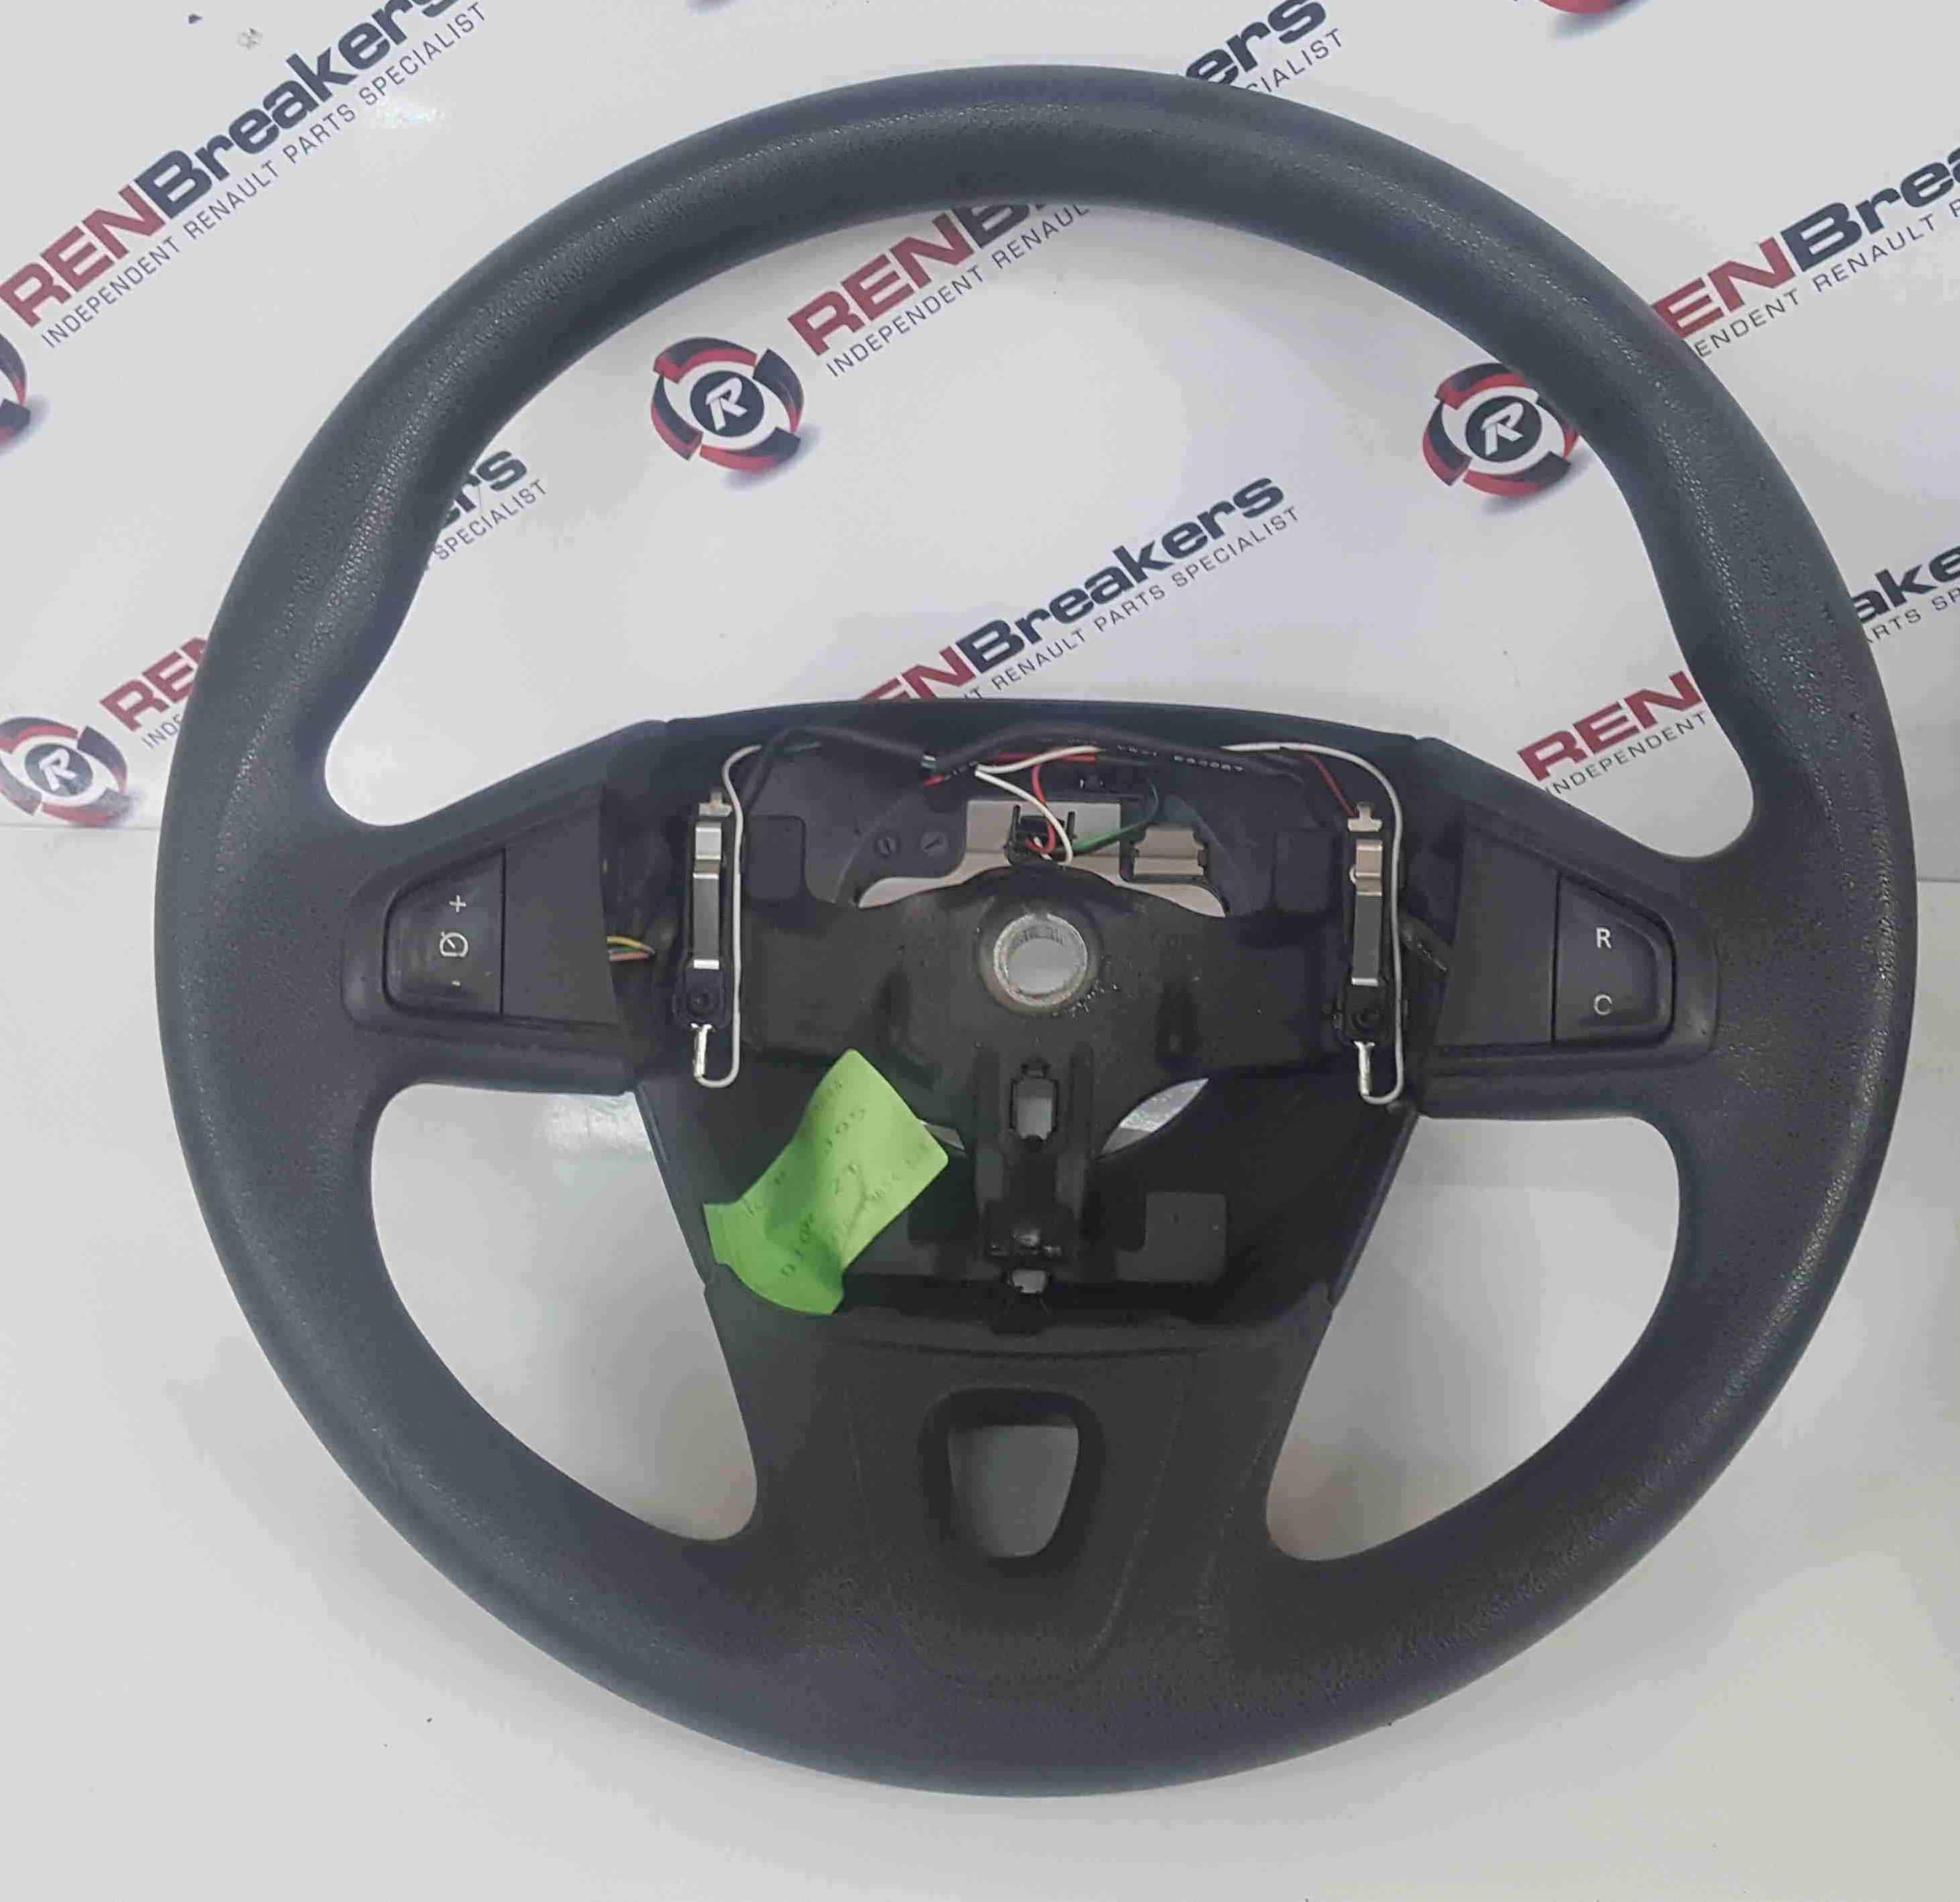 Renault Scenic MK3 2009-2013 Steering Wheel Plain Black Cruise Control